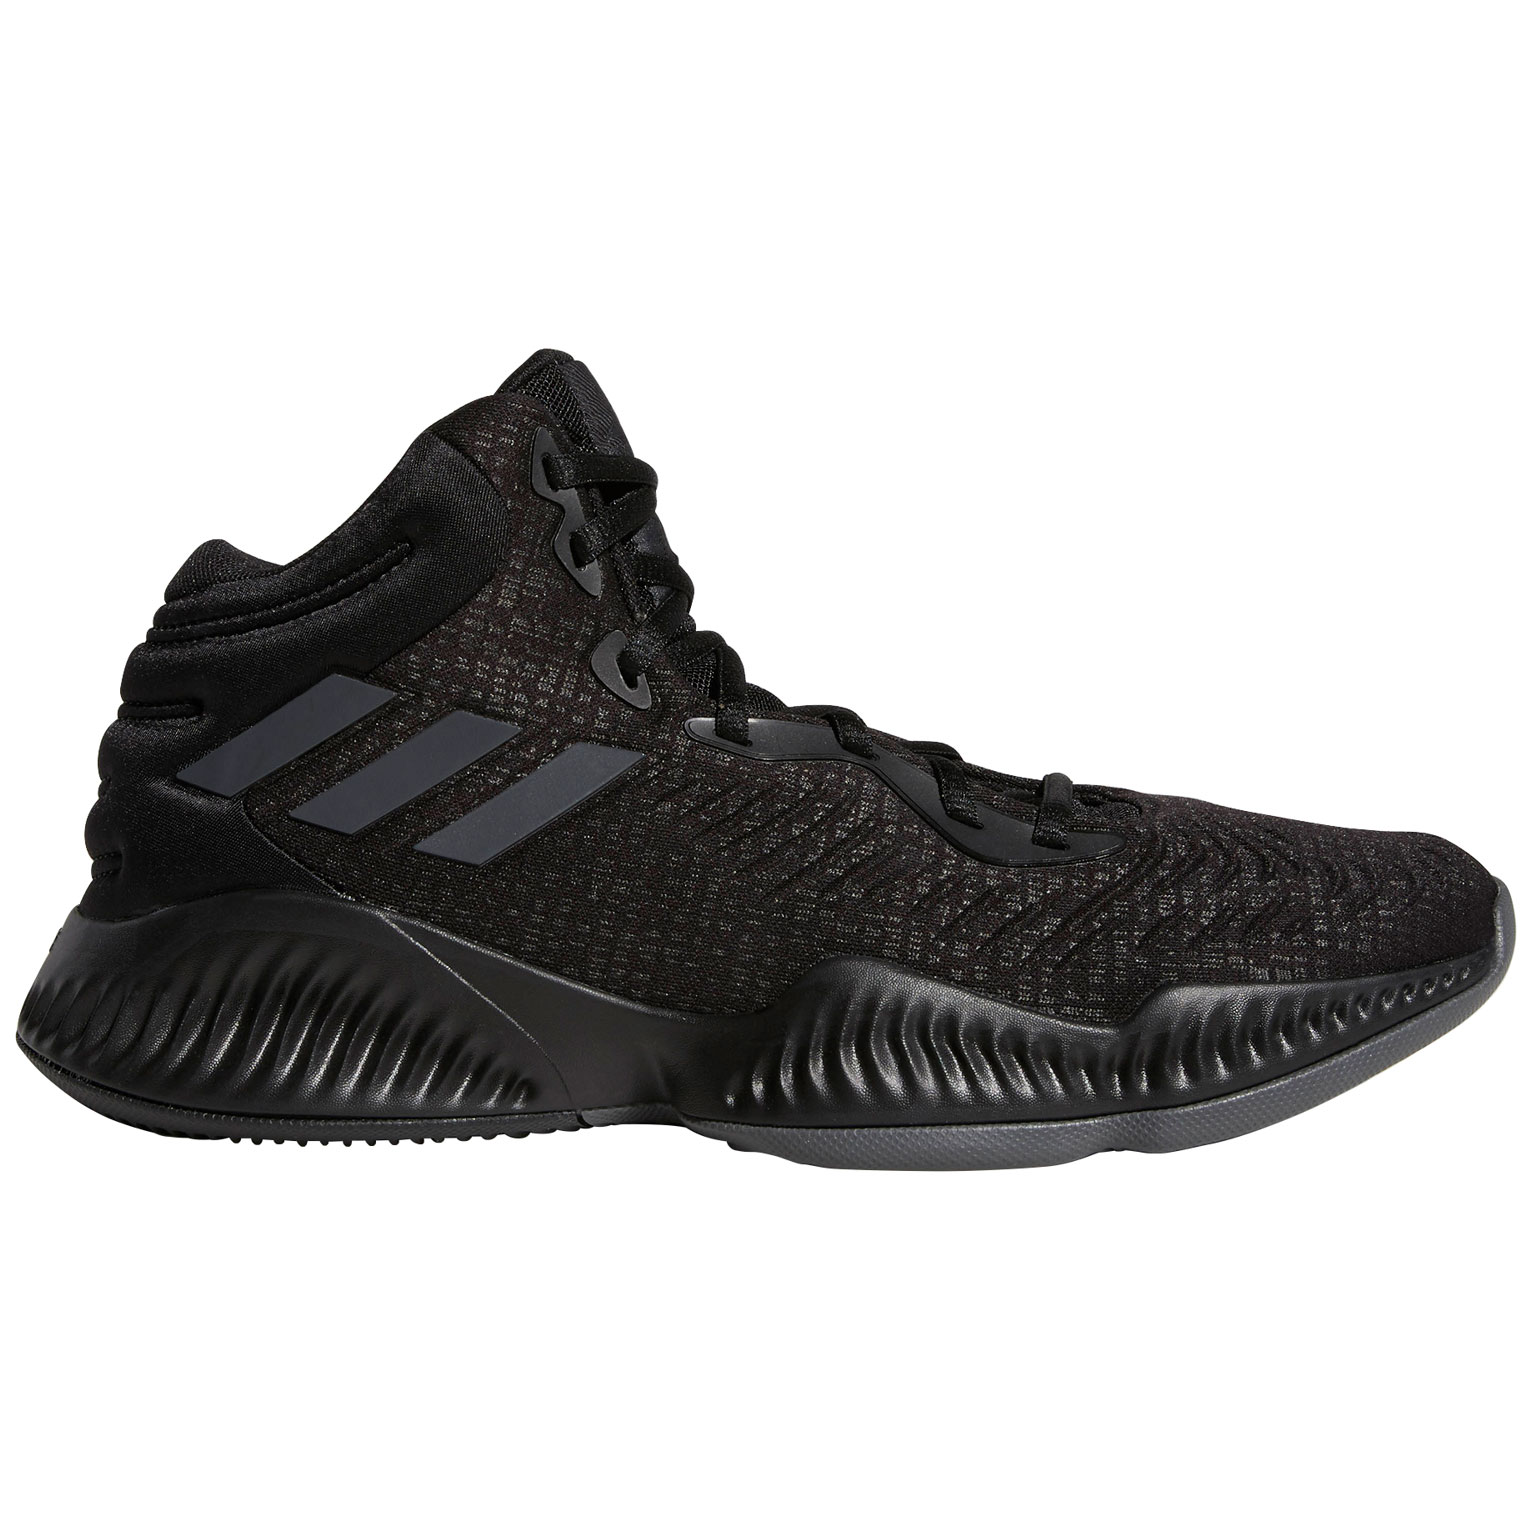 perfekt Adidas Mad Bounce Basketball Schuhe Grau Sneakers